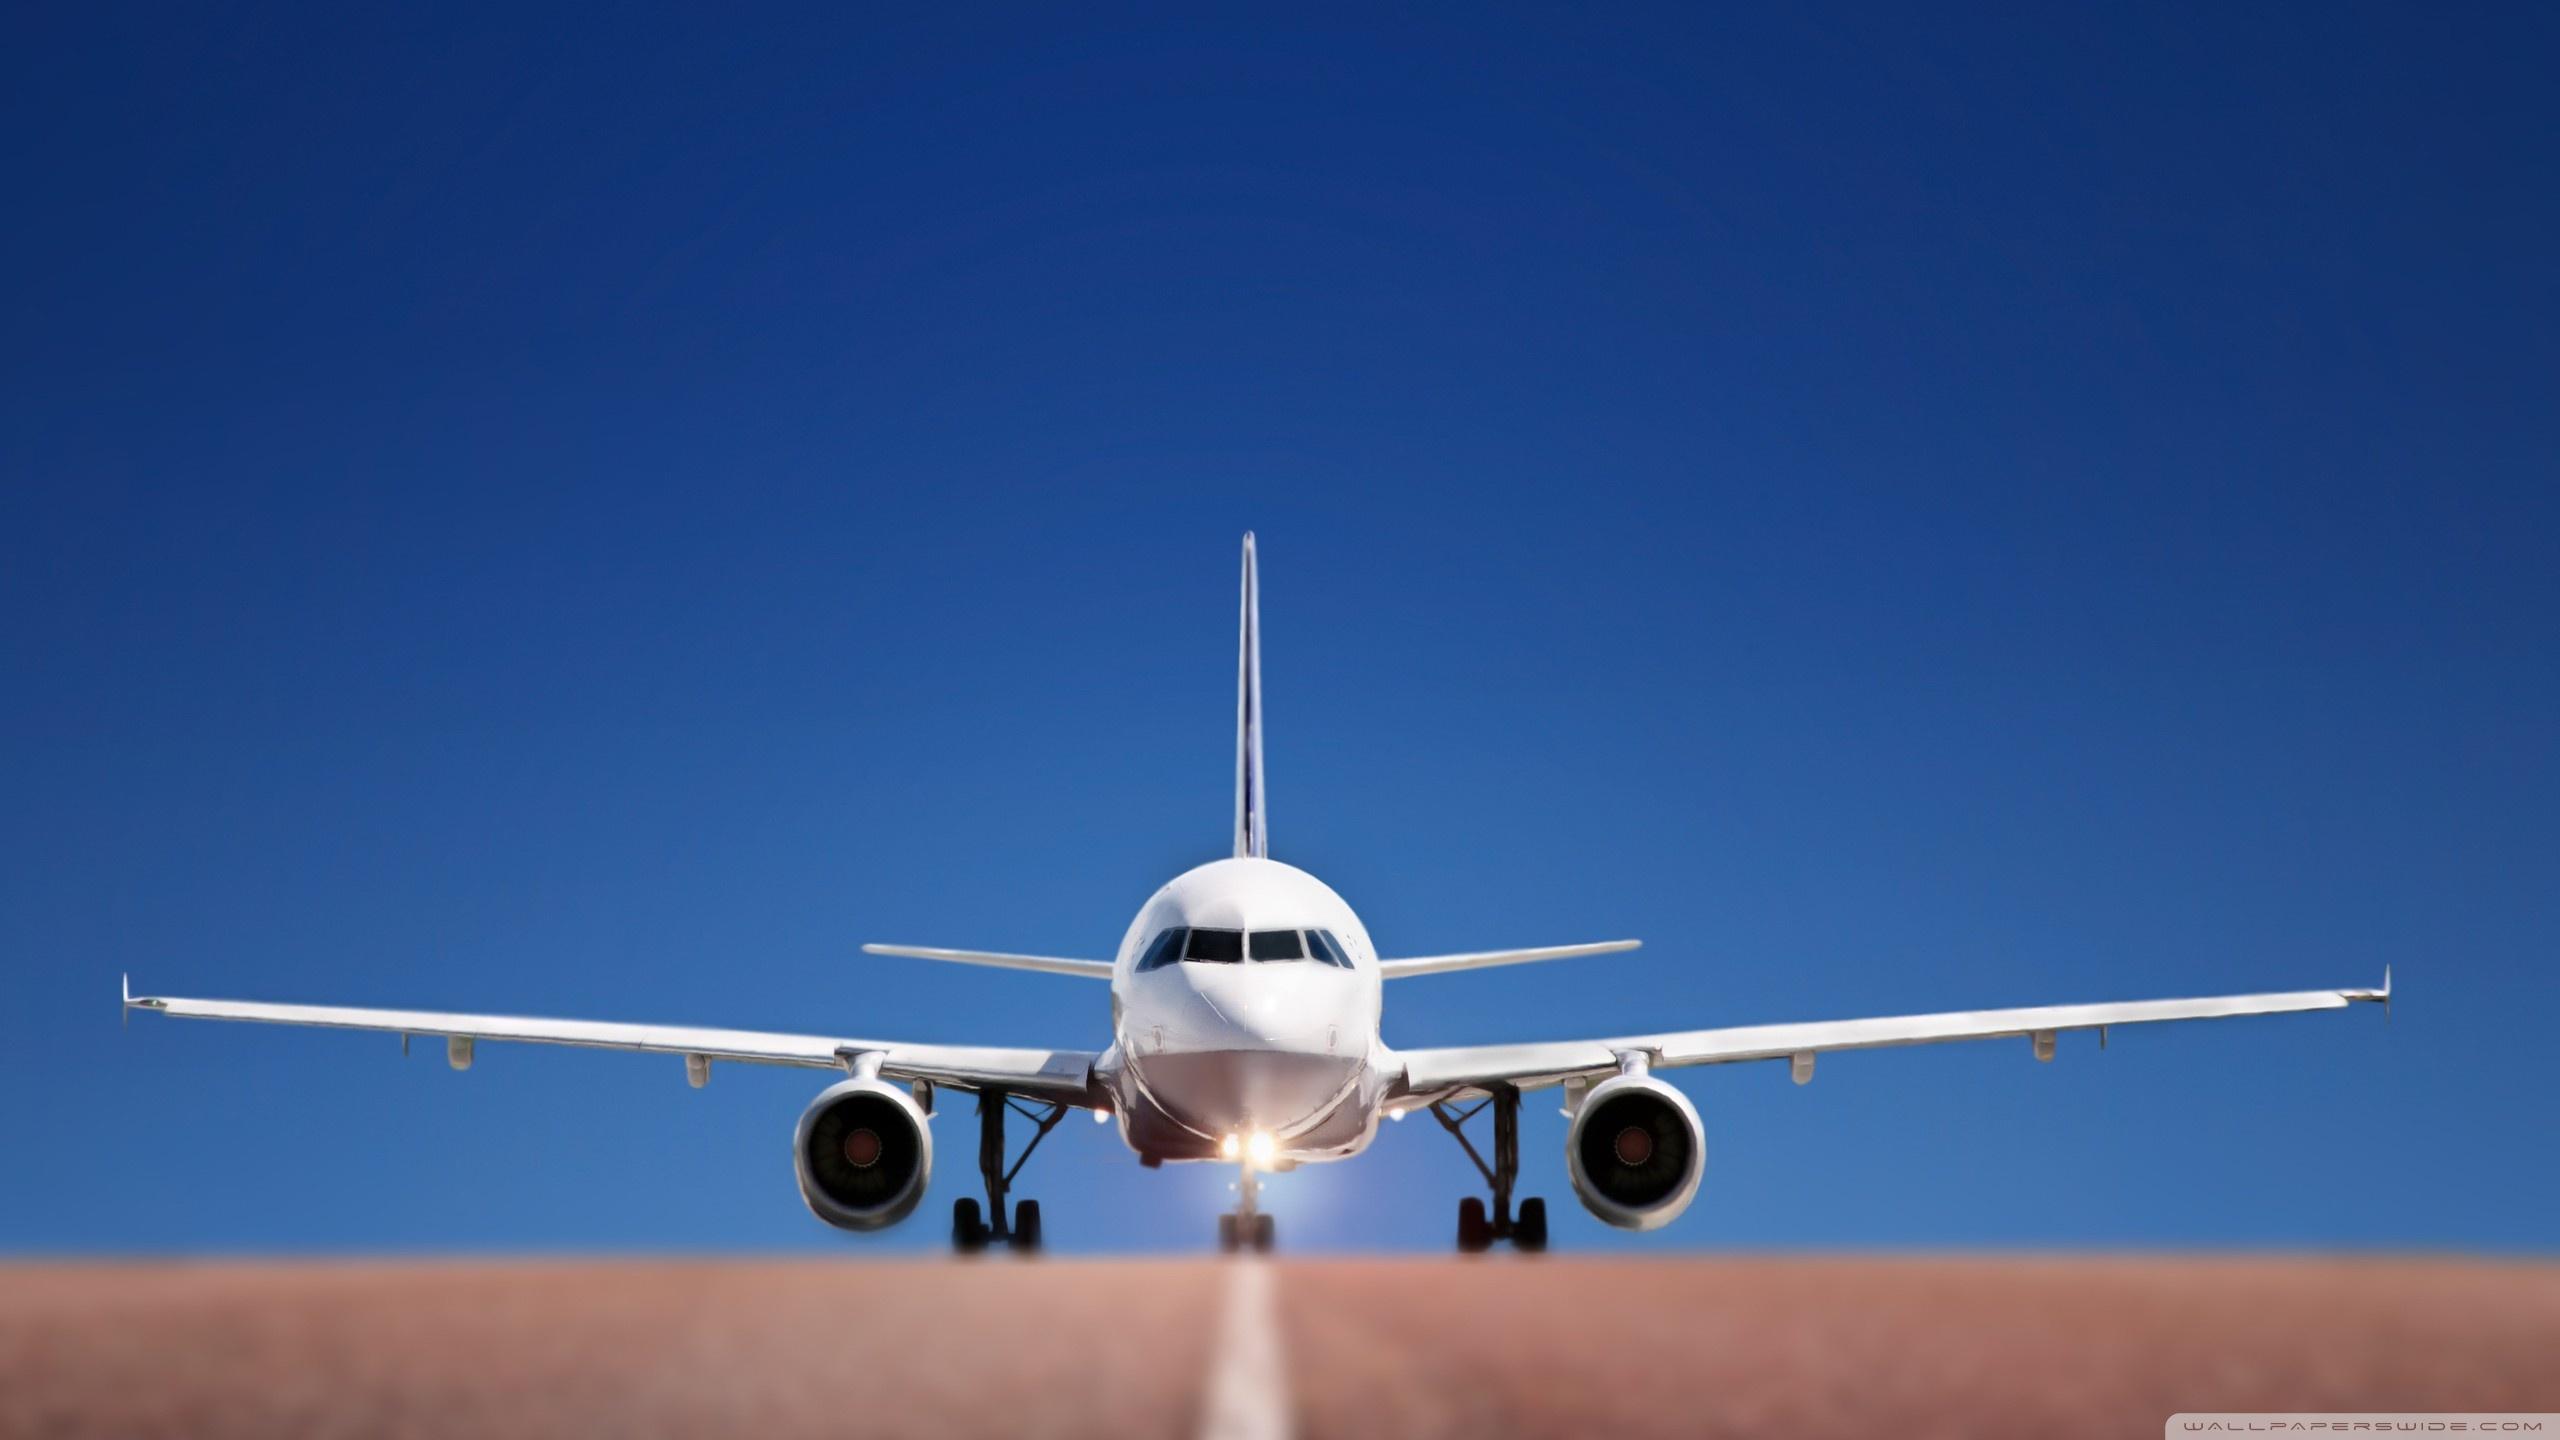 Plane Taking Off Wallpapers - Wallpaper